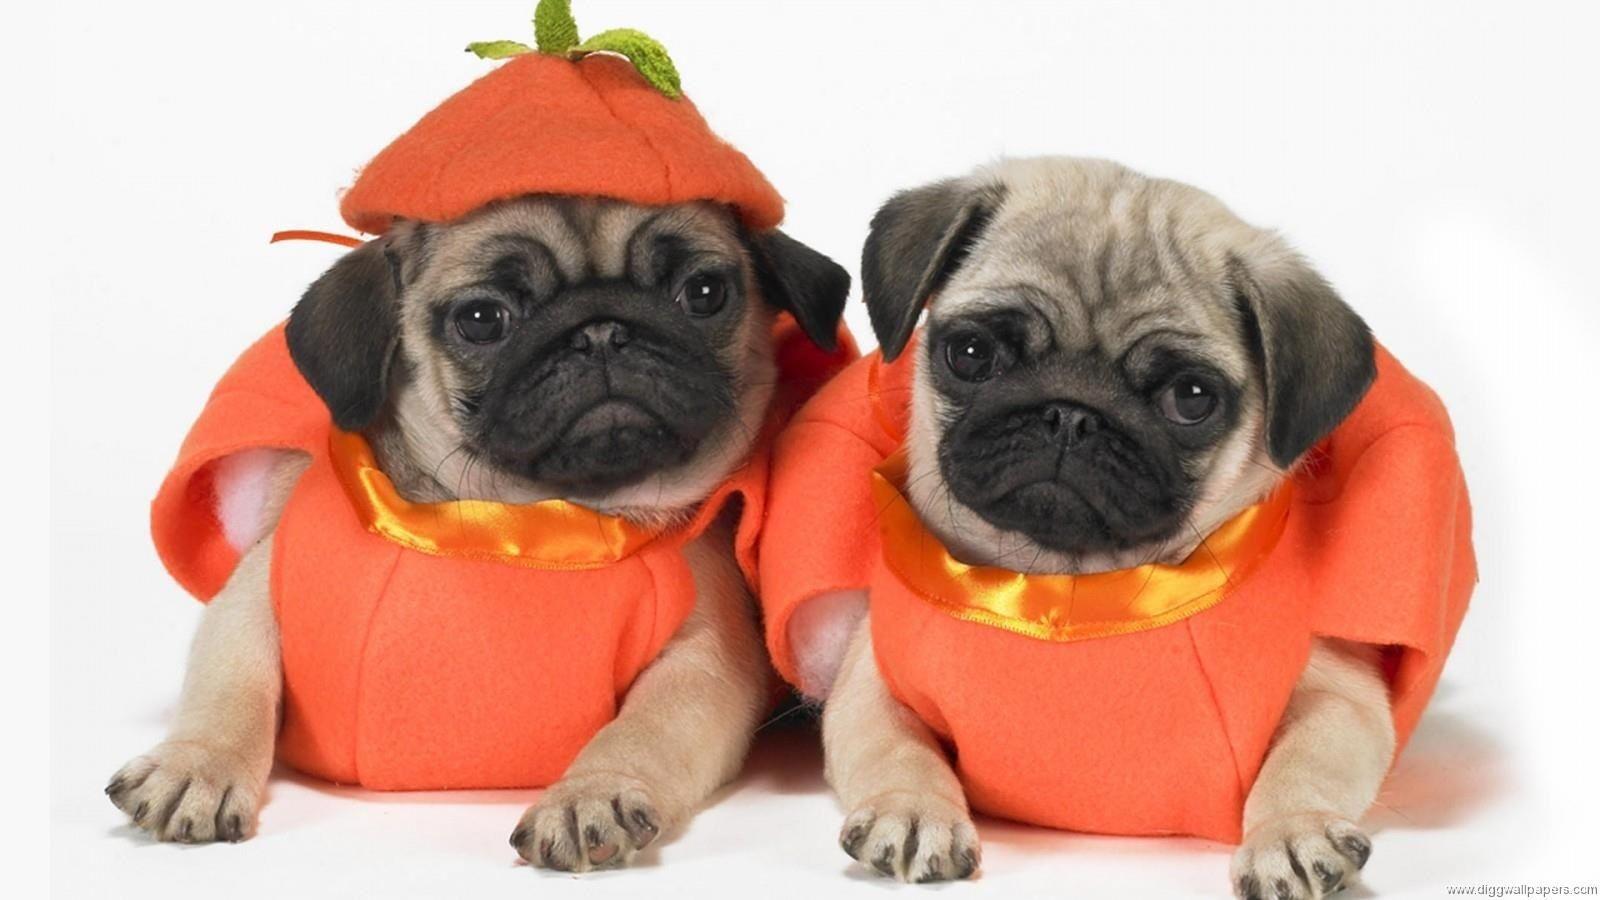 Halloween Pugs Cute Pugs Pugs In Costume Halloween Animals